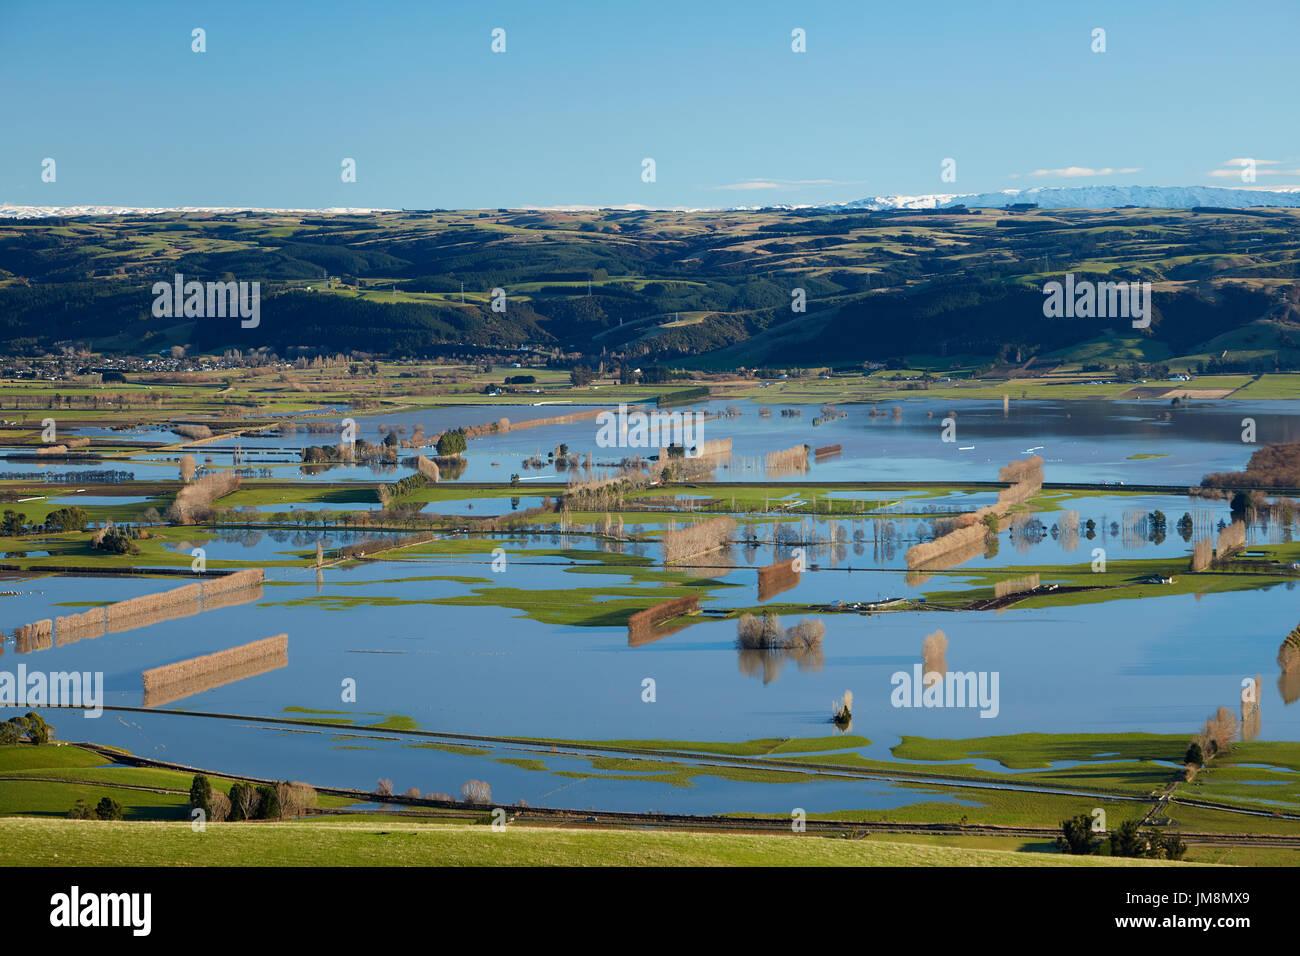 Flooded farmland on Taieri Plains, near Mosgiel, Dunedin, South Island, New Zealand Stock Photo